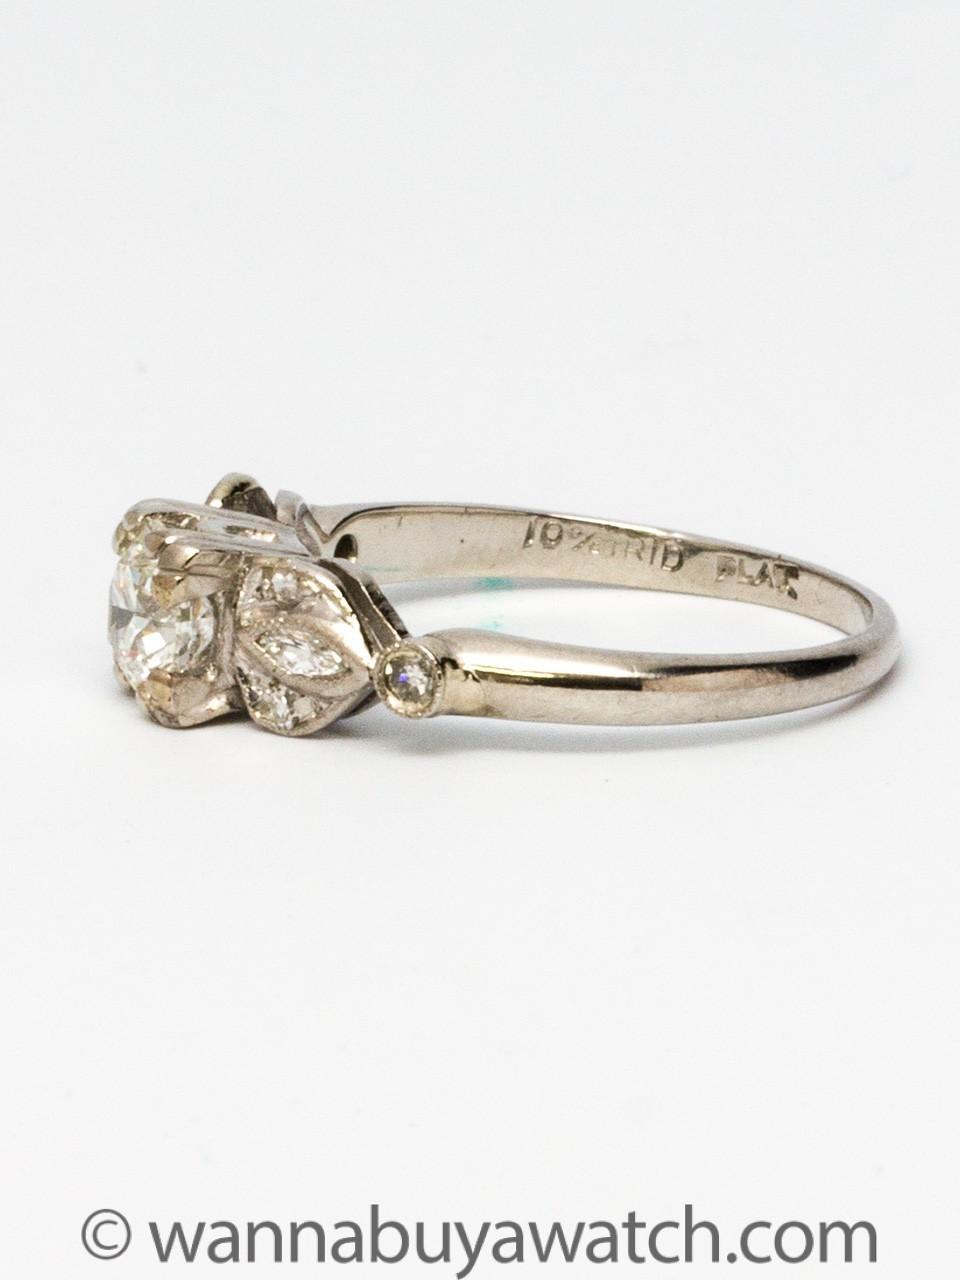 1940's Platinum & 0.51ct Transition Cut Diamond Solitaire